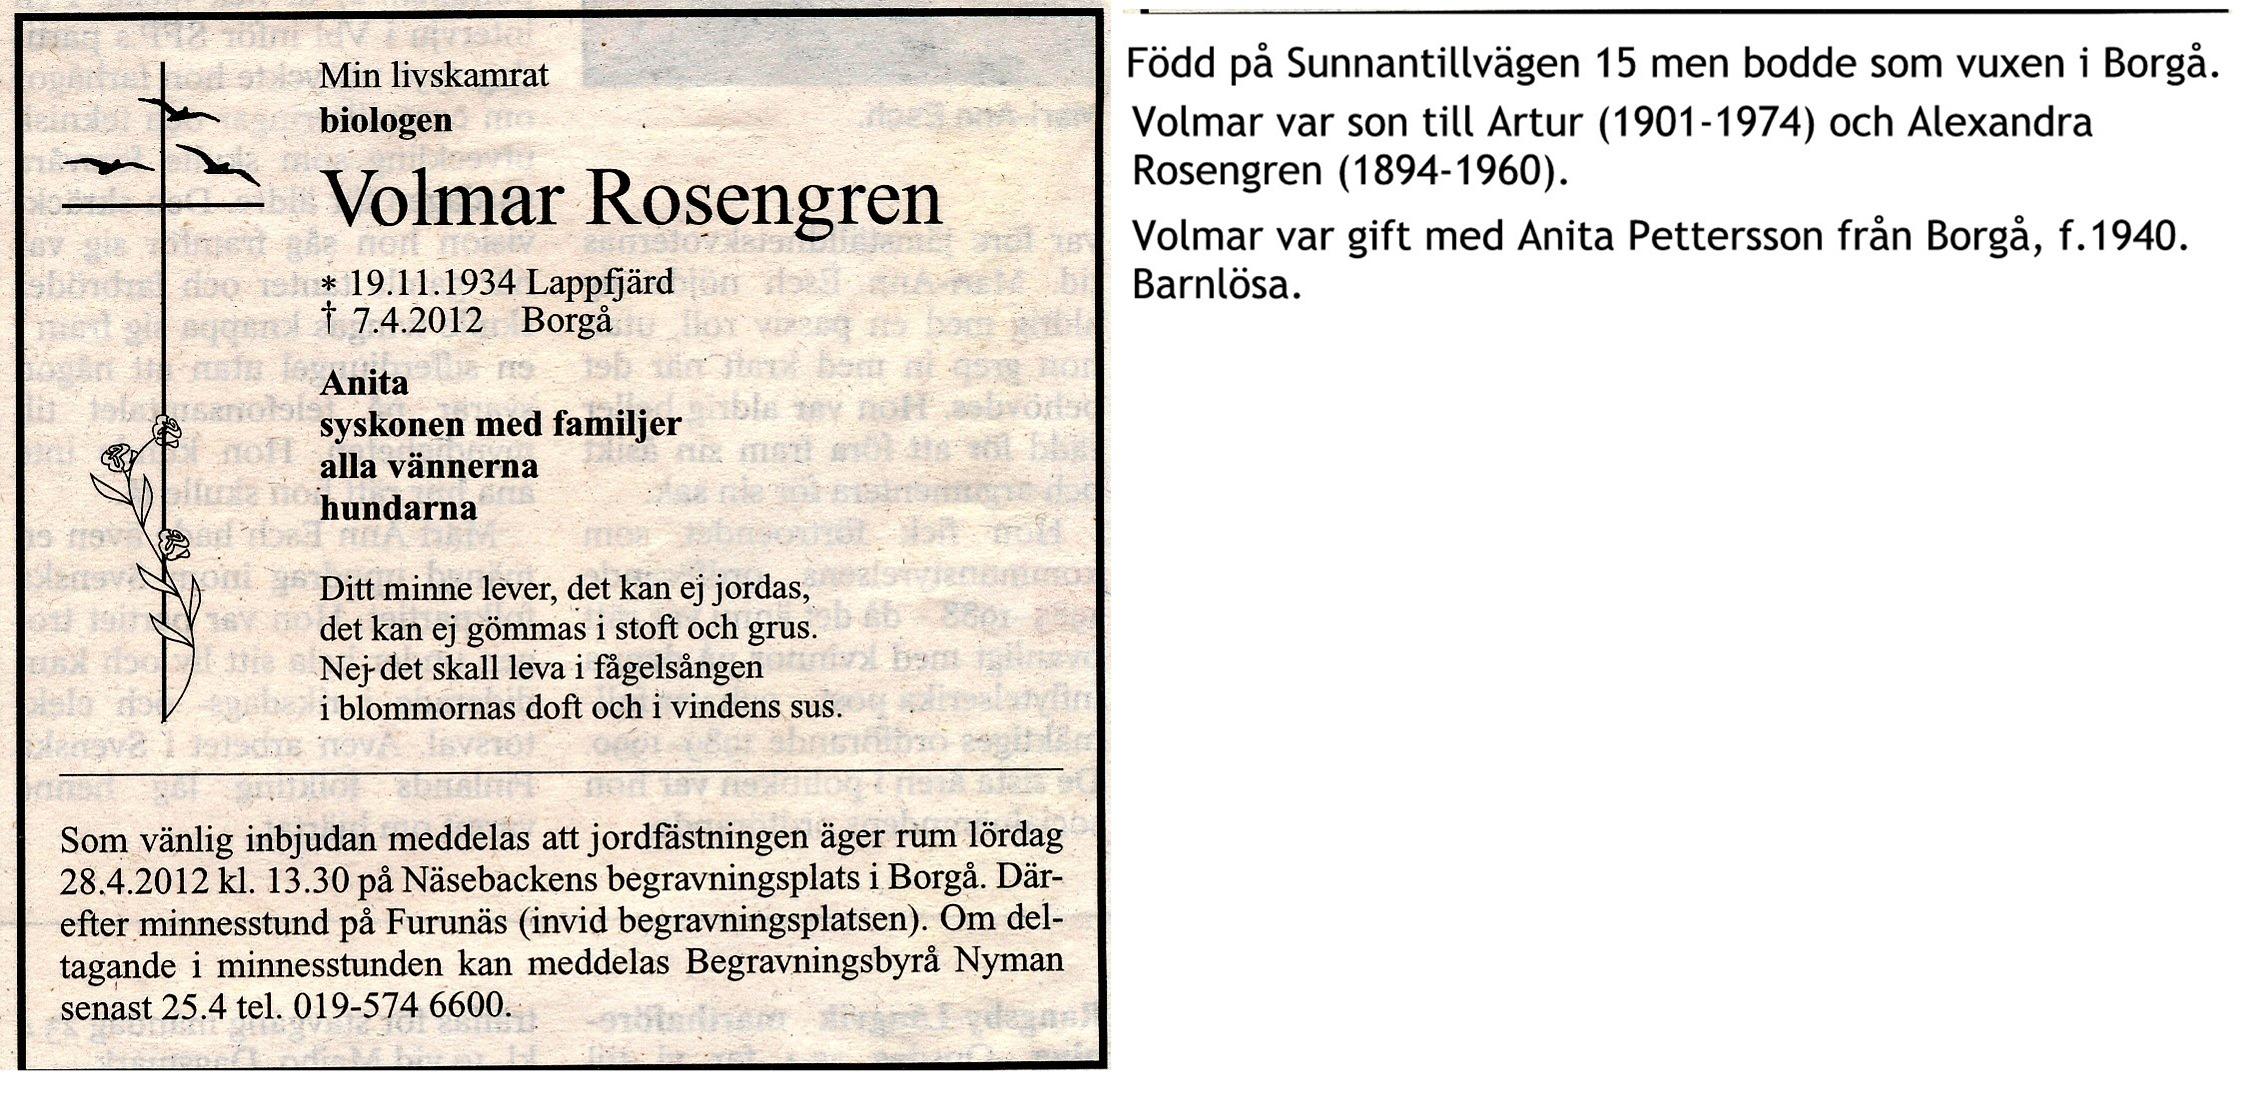 Rosengren Volmar